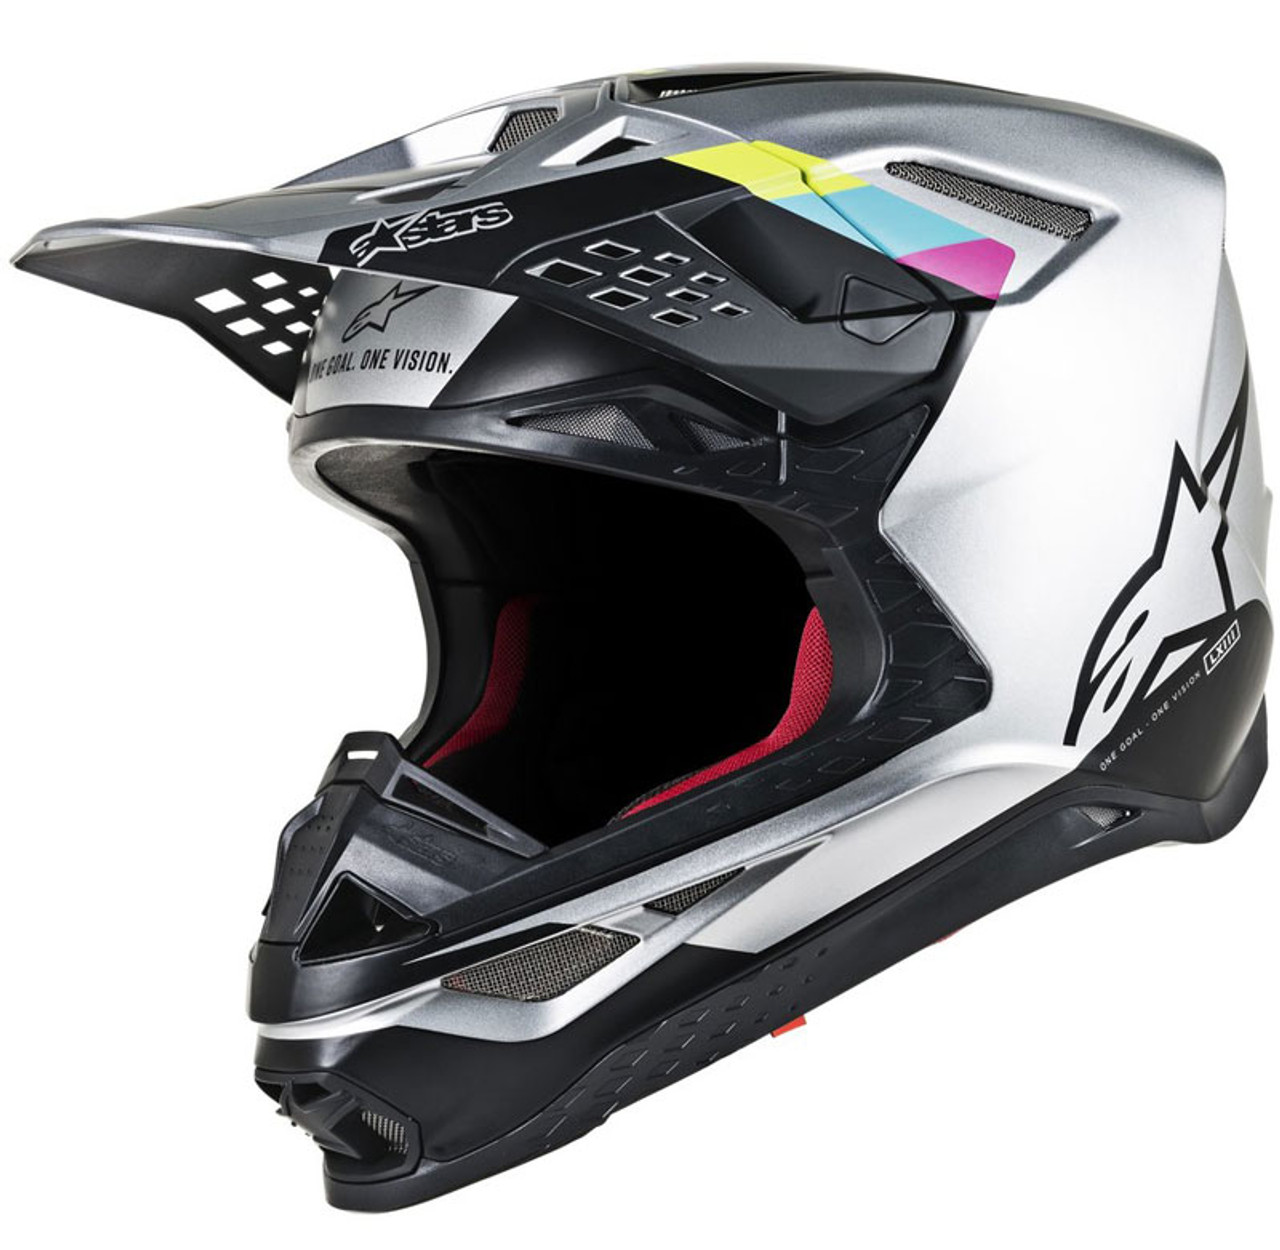 Alpinestars Supertech M10//M8 Crown Pad Off-Road Motorcycle Helmet Accessories Black//Small